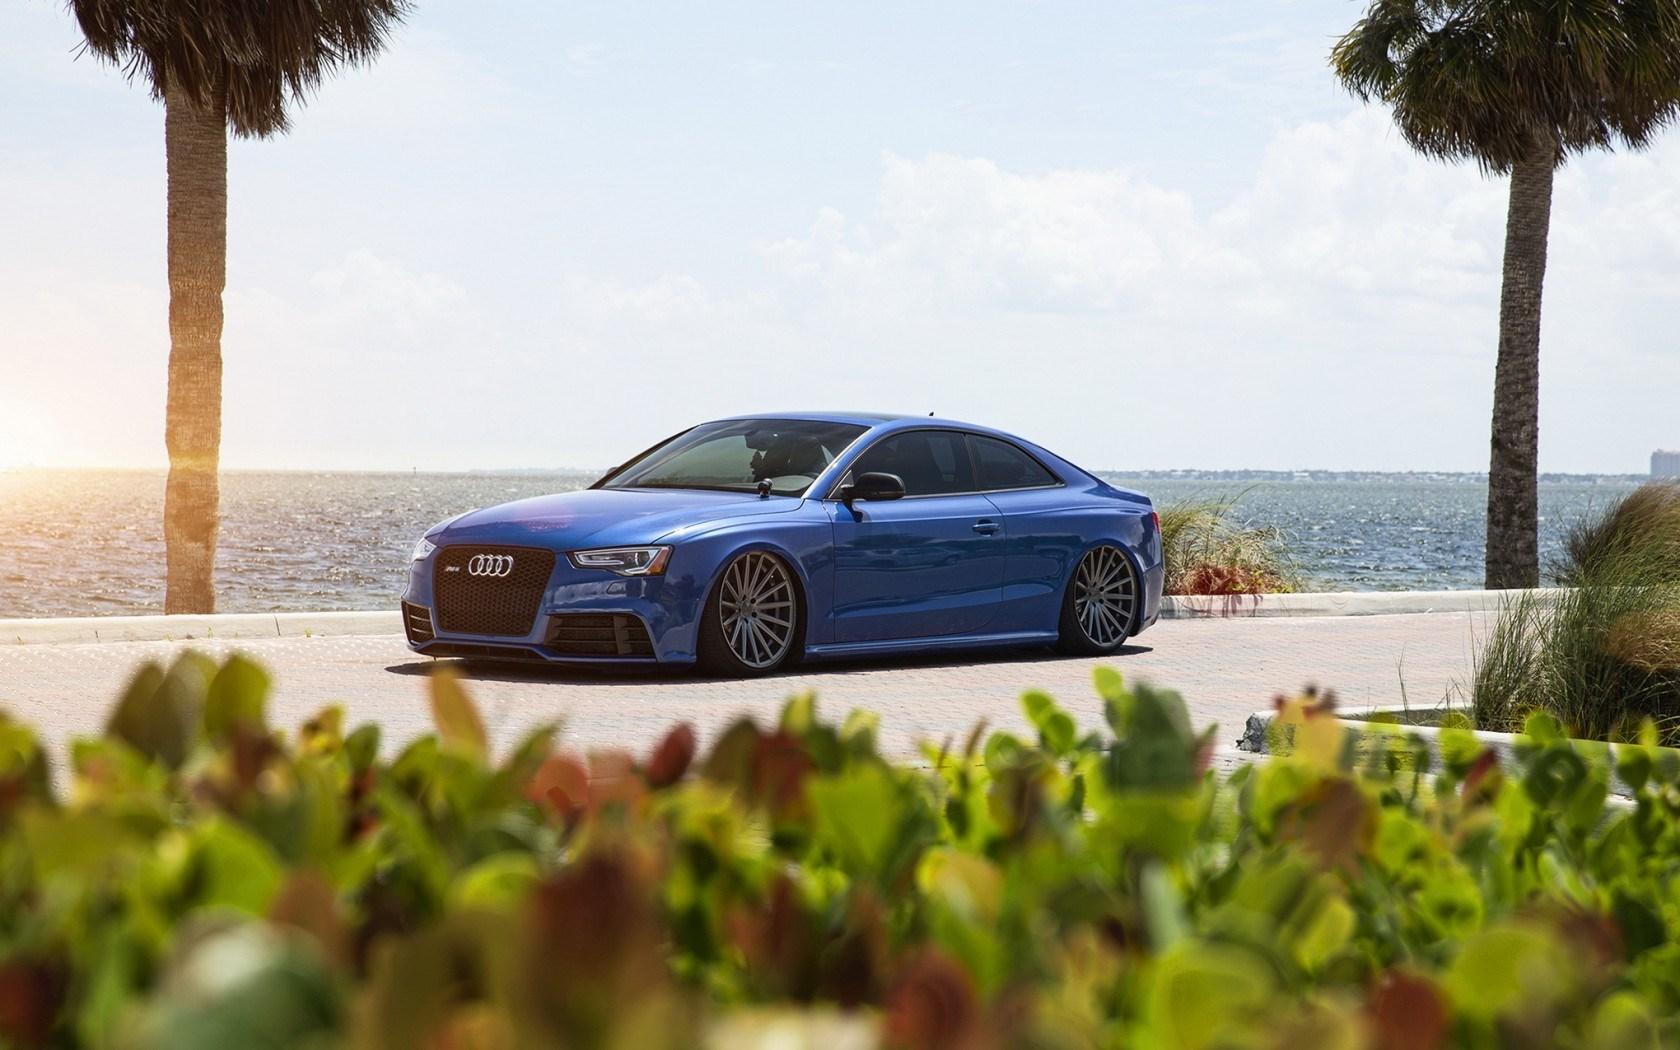 Audi Rs5 Wallpaper 37031 1680x1050 Px Hdwallsource Com